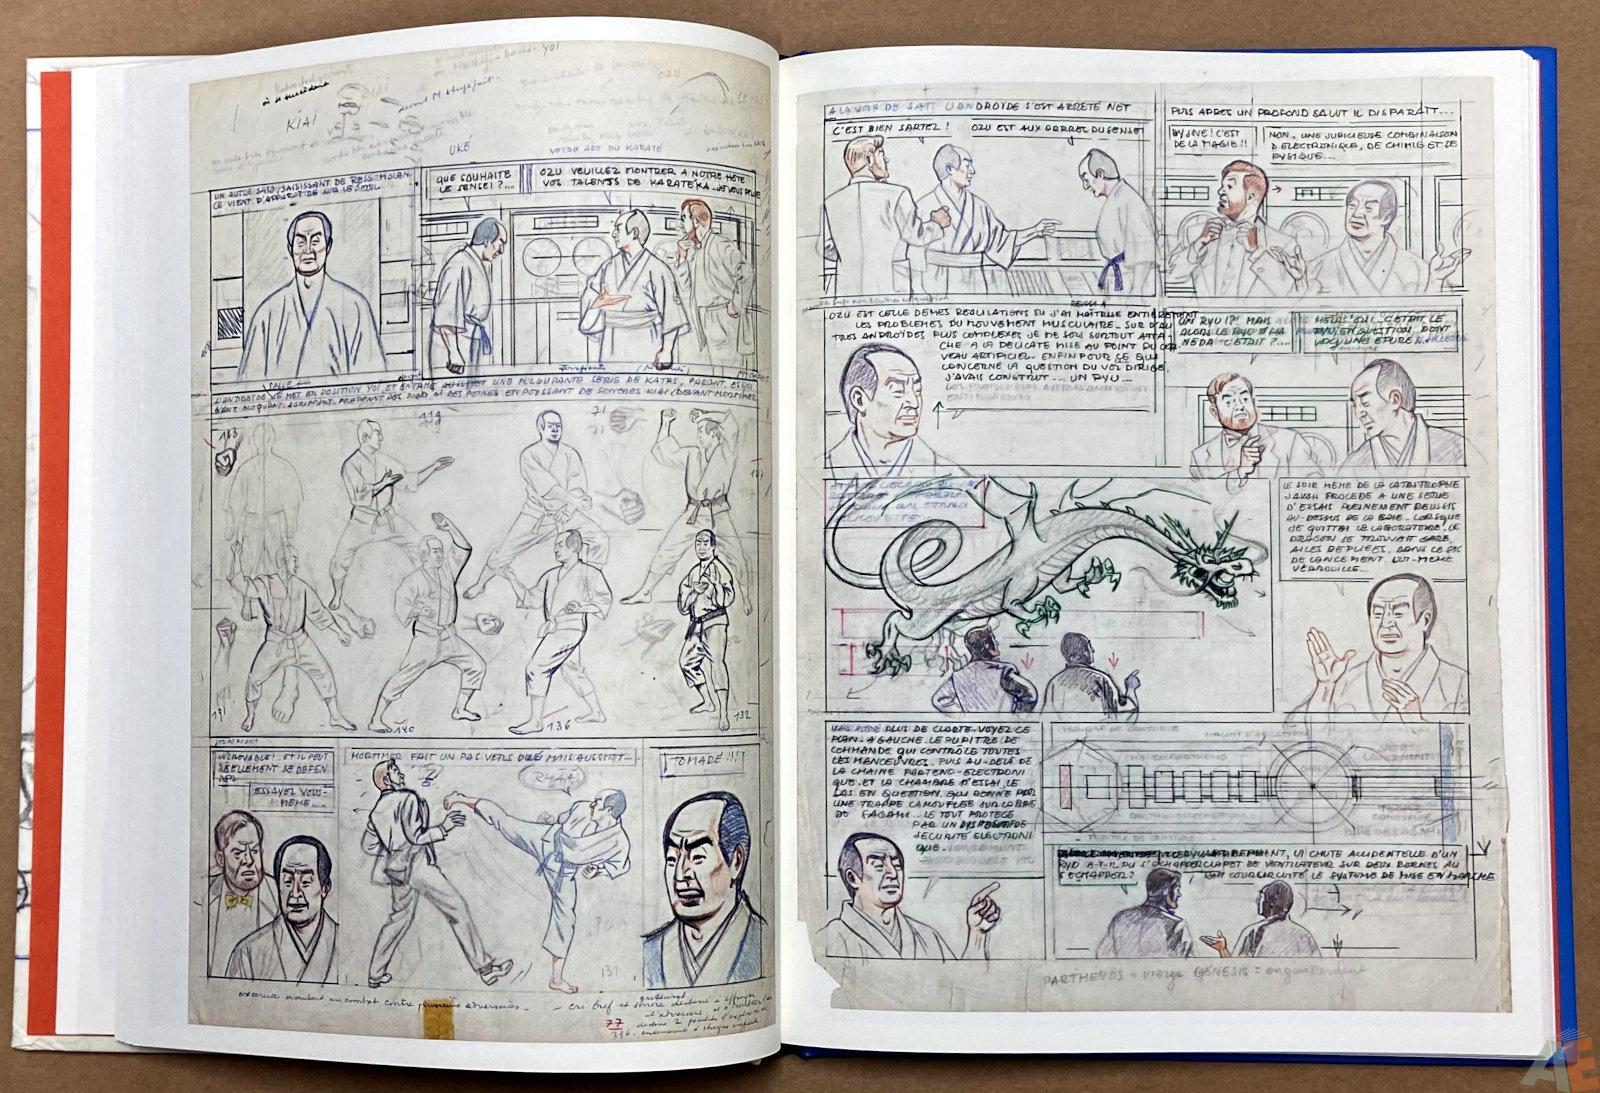 Les 3 Formules Du Professeur Sato Decoupage Original interior 5